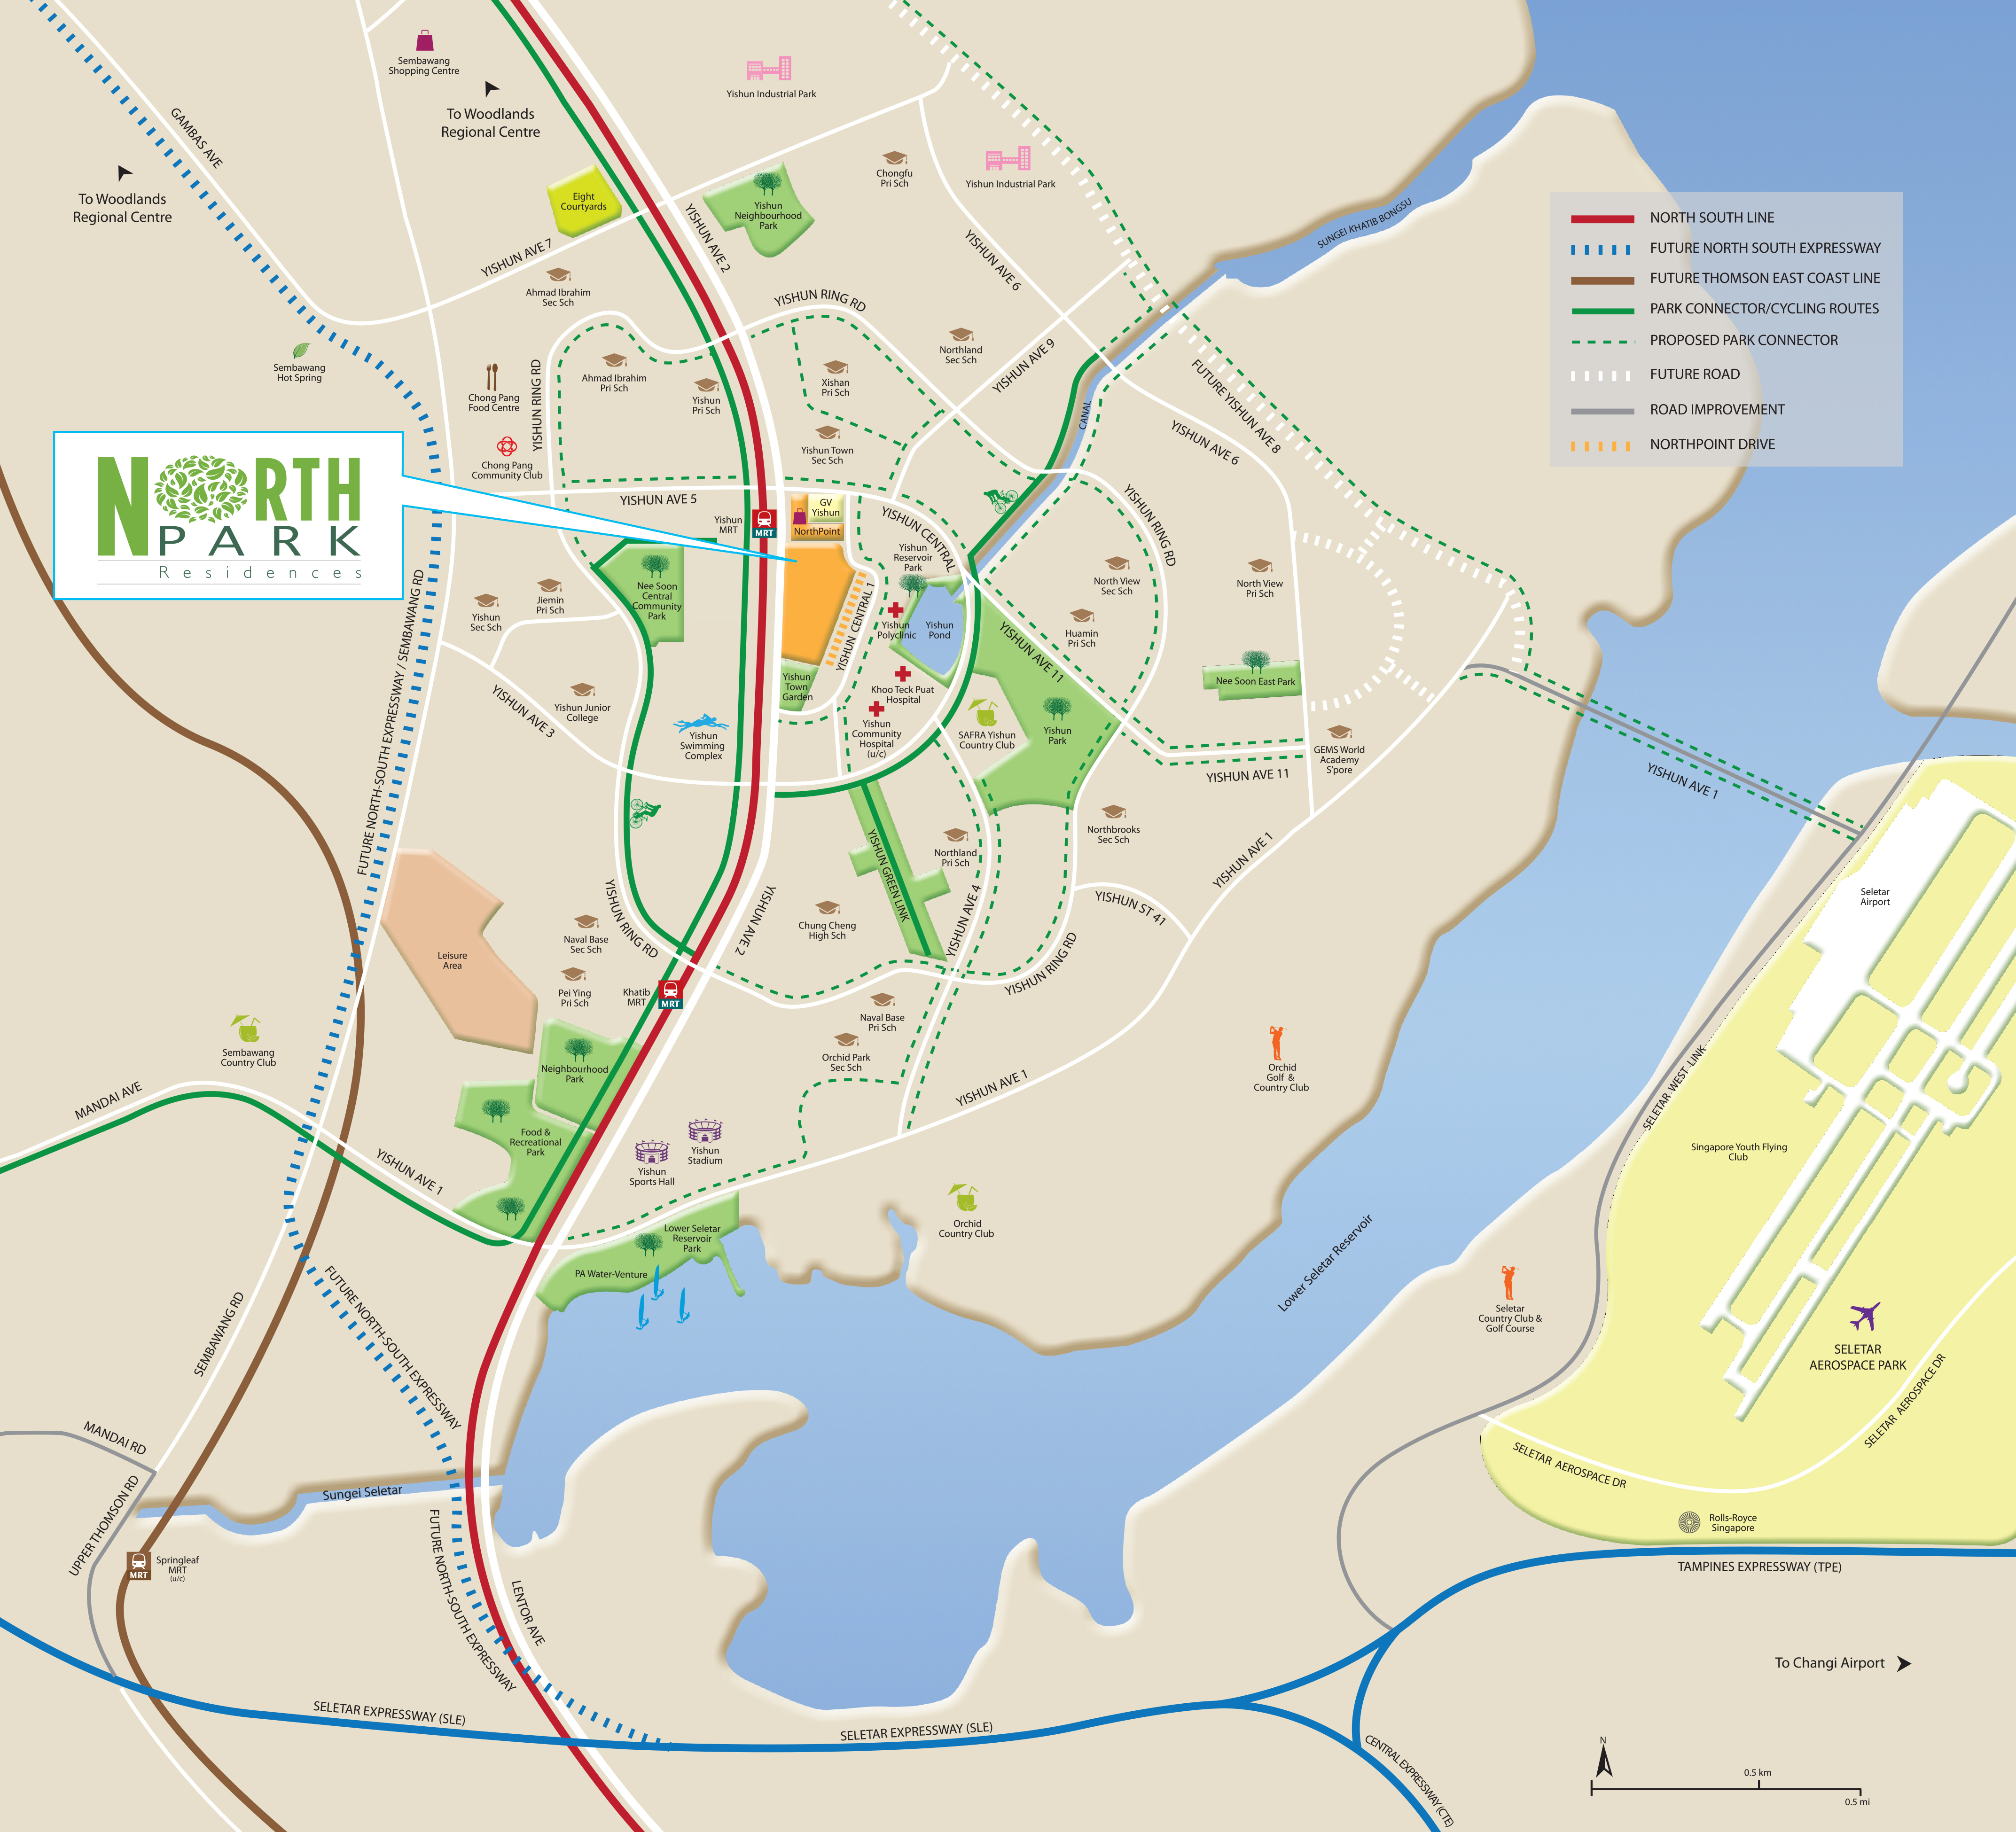 NorthPark Map